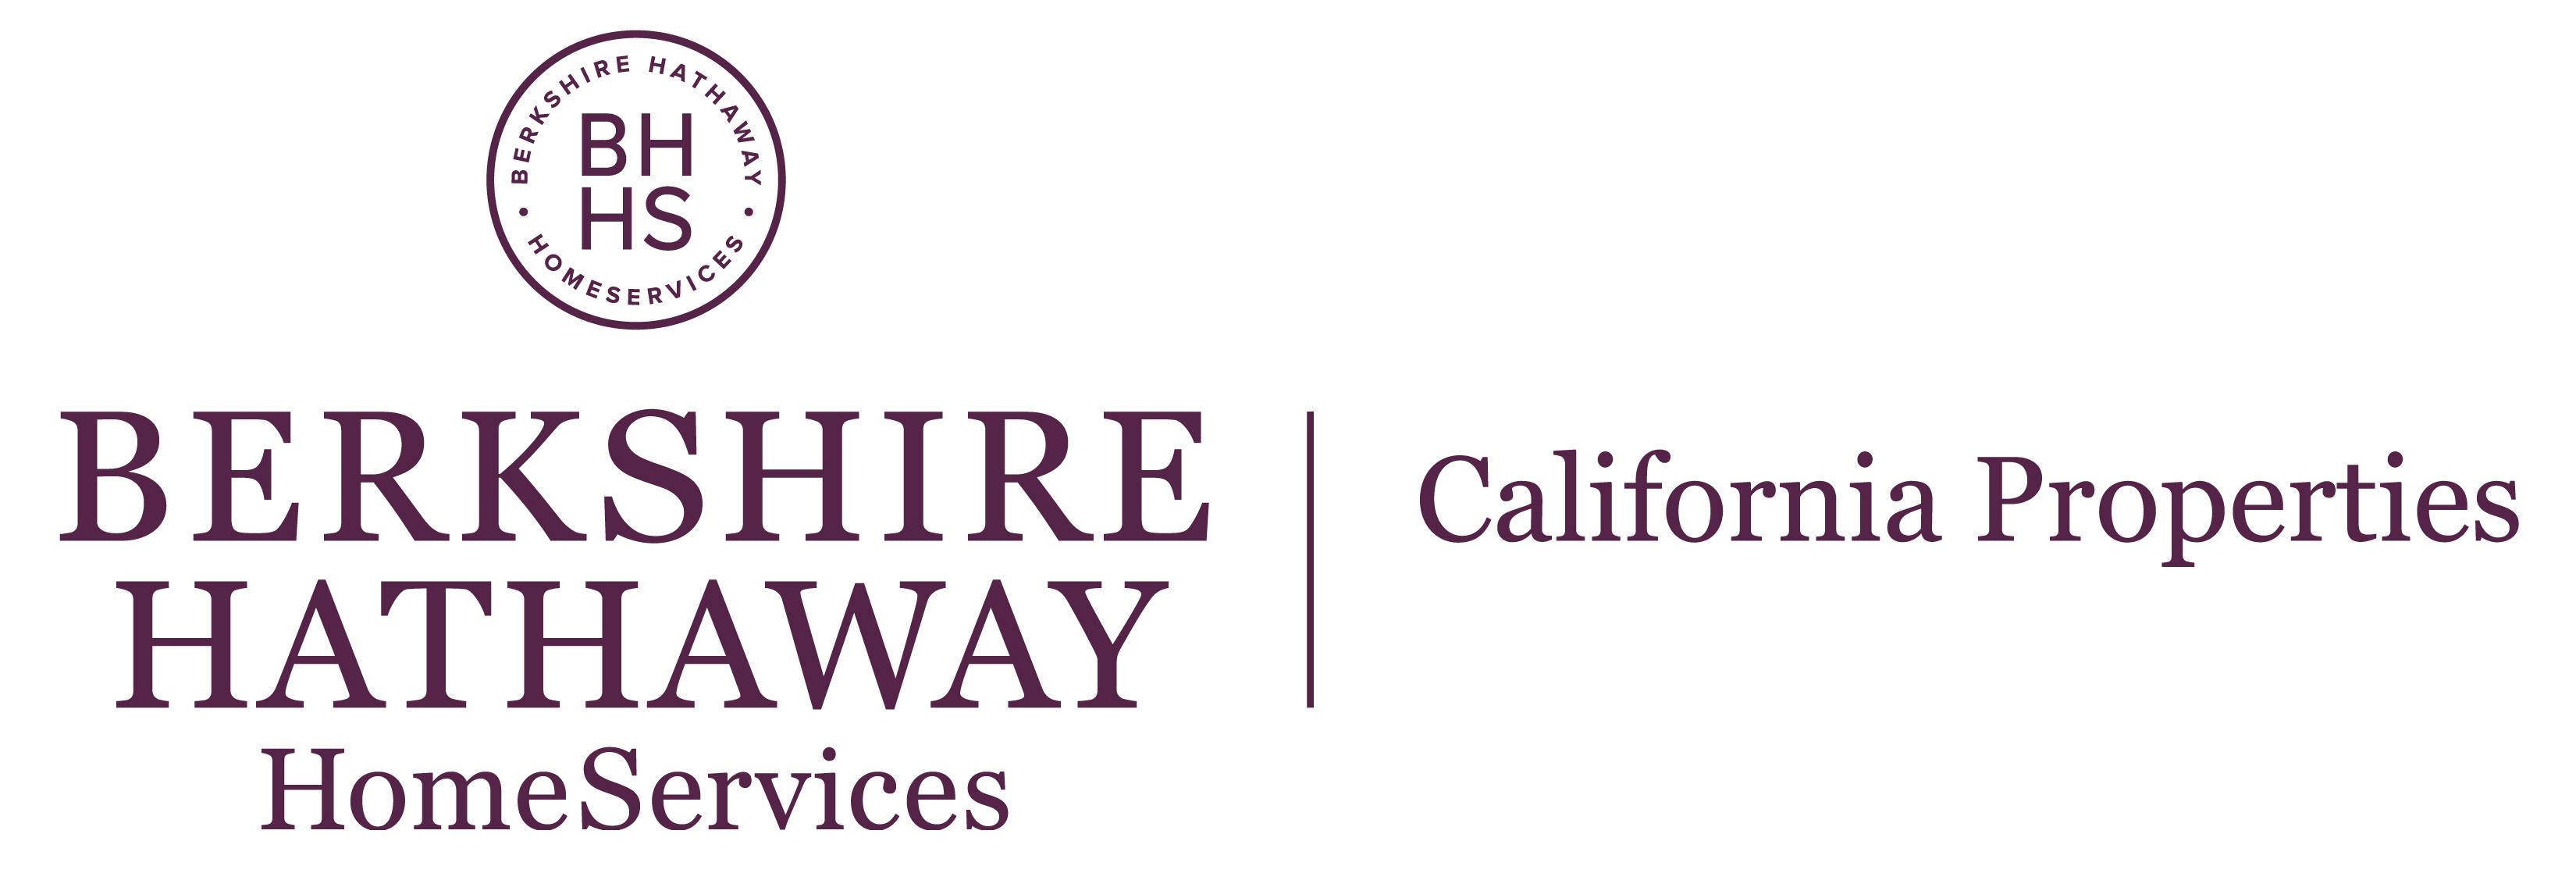 John Fitzpatrick Of Whittier Berkshire Hathaway Homeservices California Properties